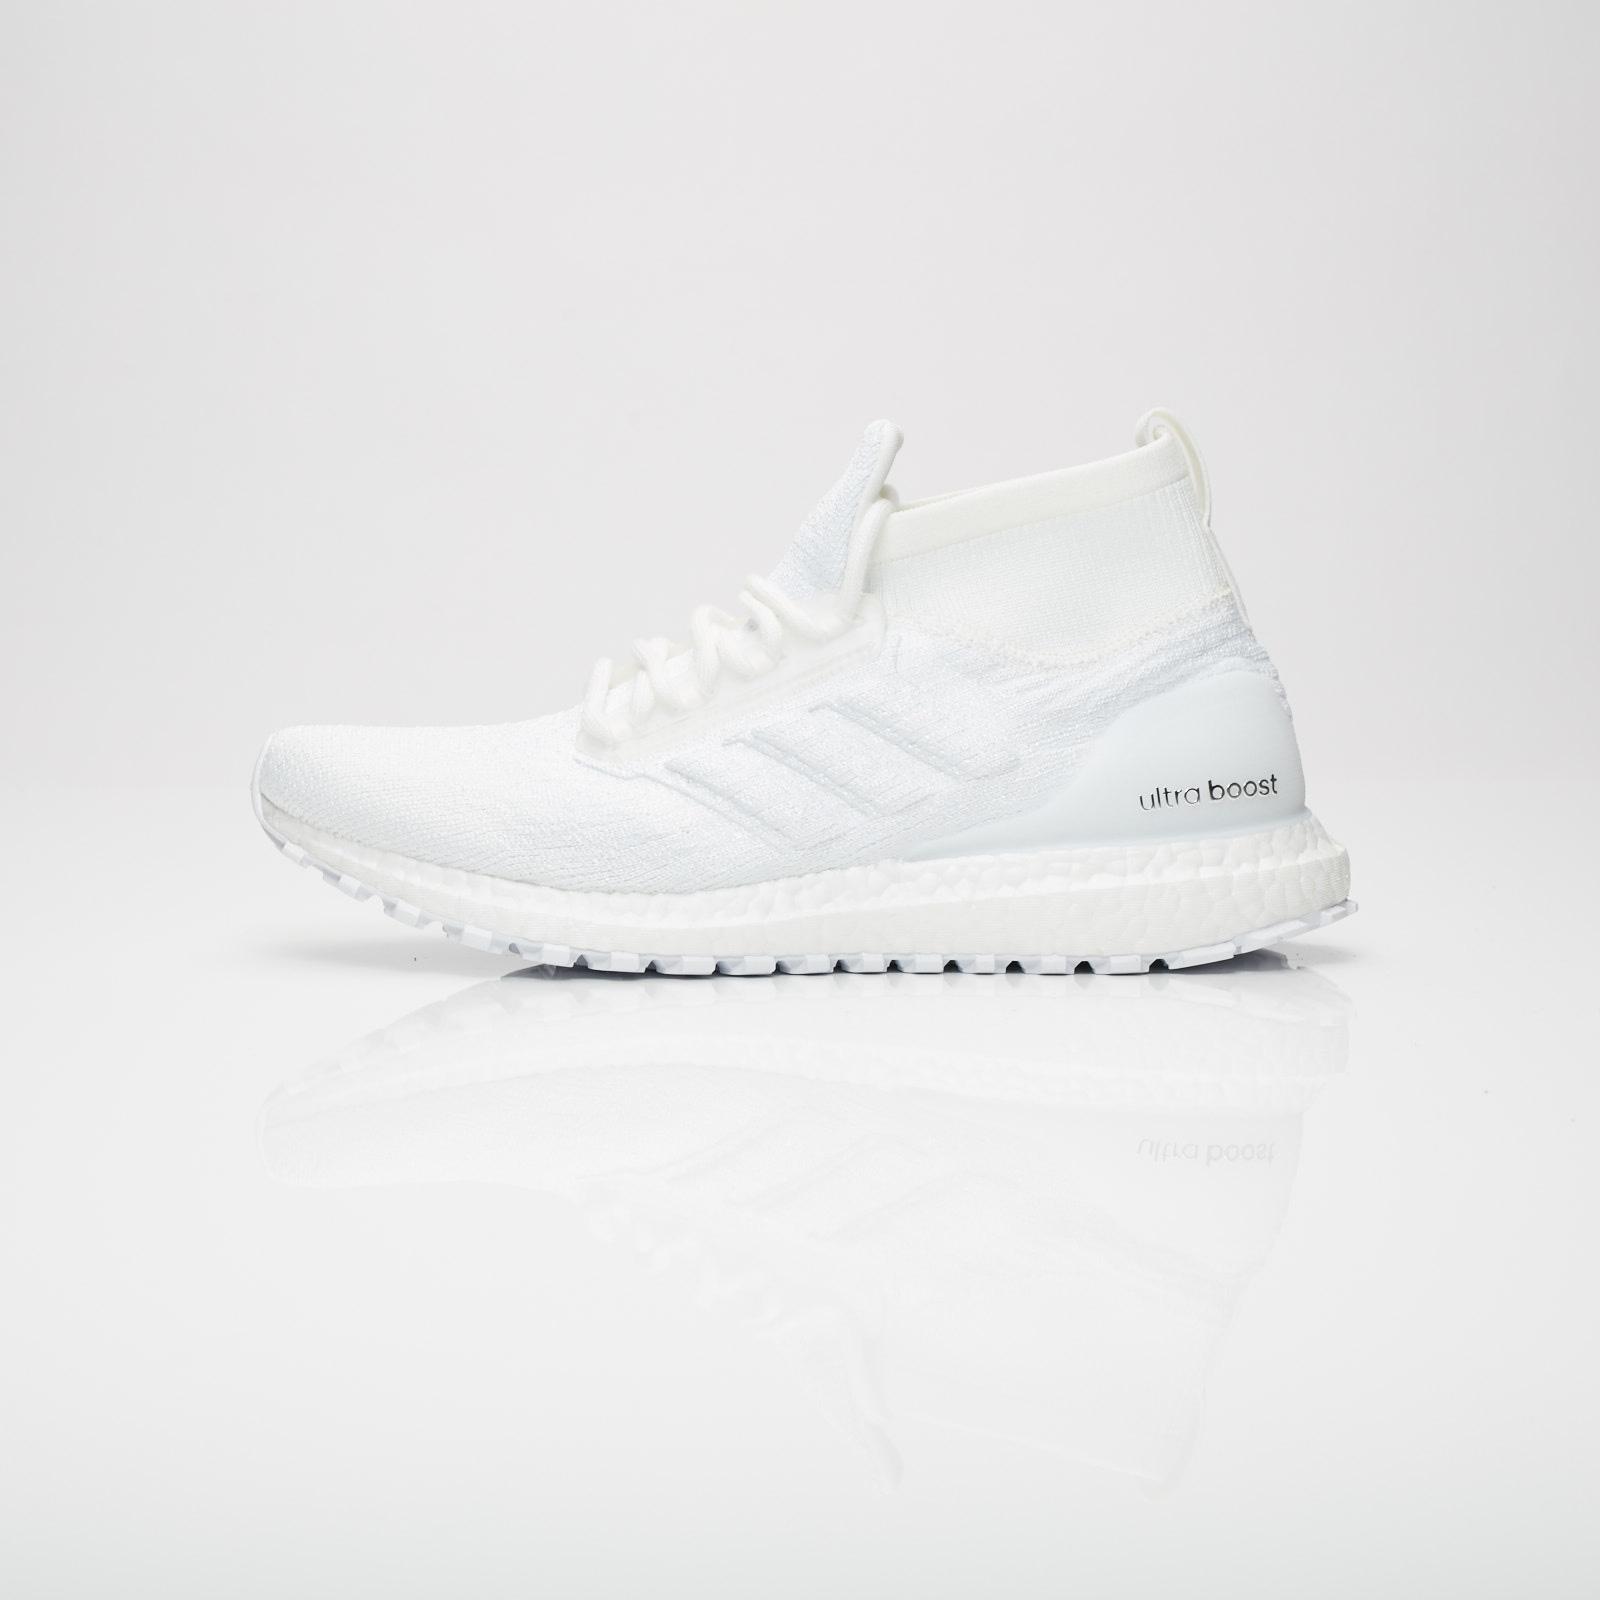 bas prix 5a33e 73c94 adidas UltraBOOST All Terrain - Bb6131 - Sneakersnstuff ...